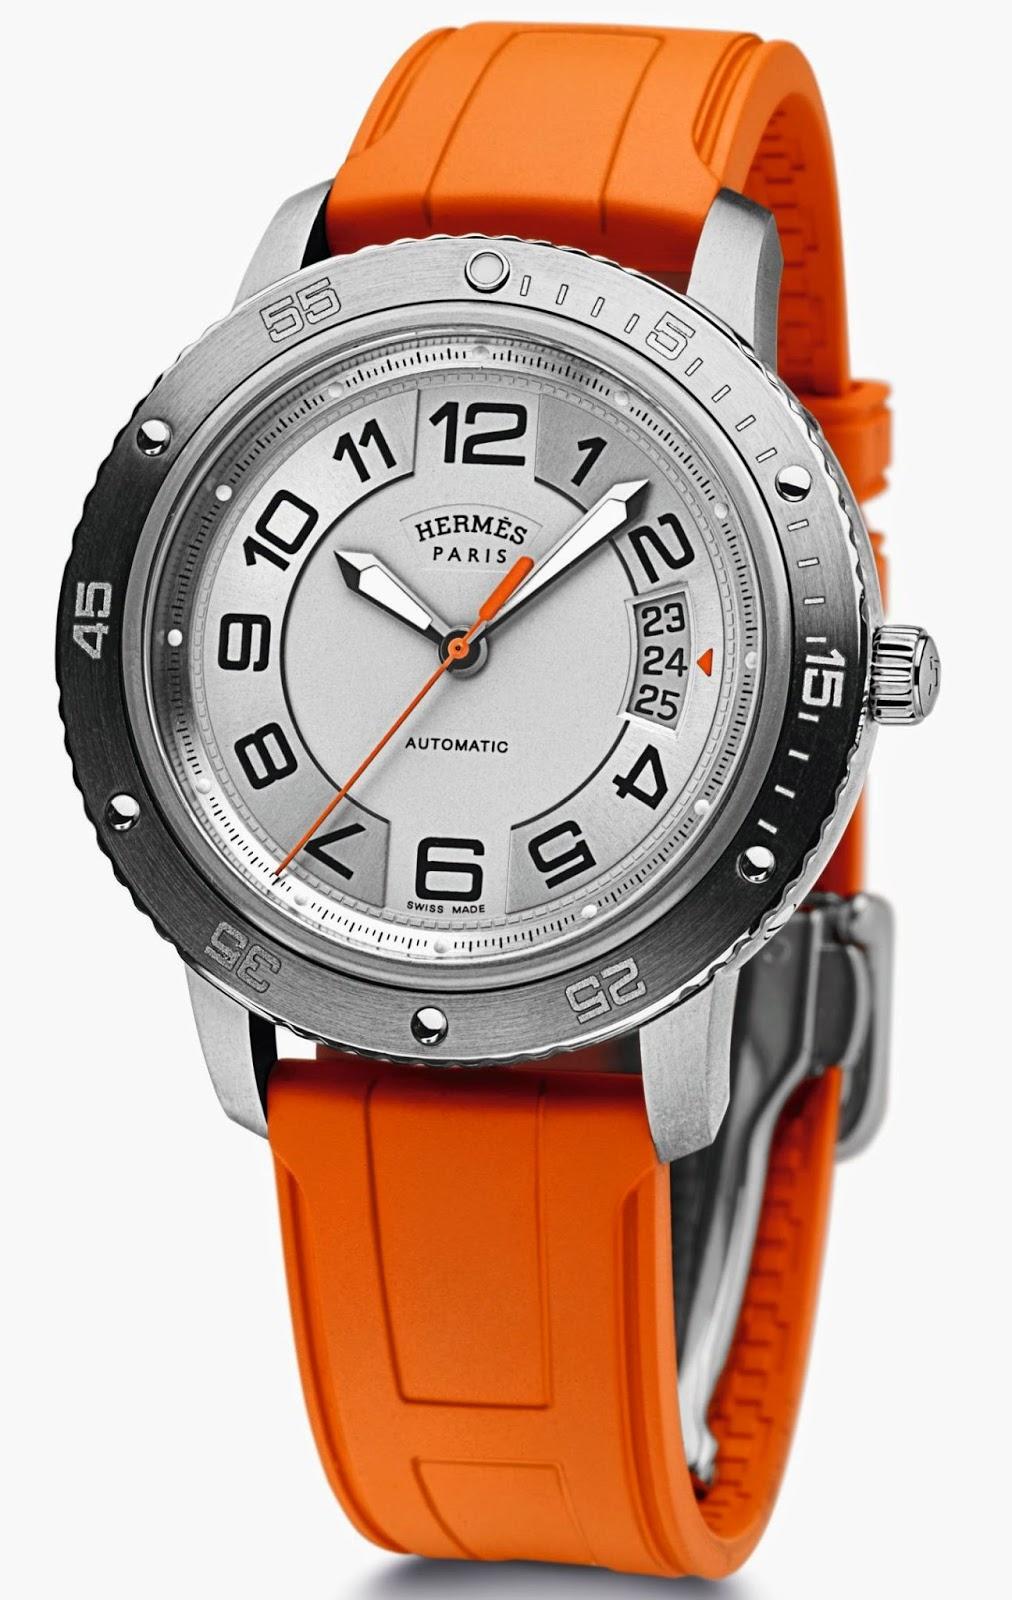 Hermès Clipper Sport automatic watch with orange rubber strap